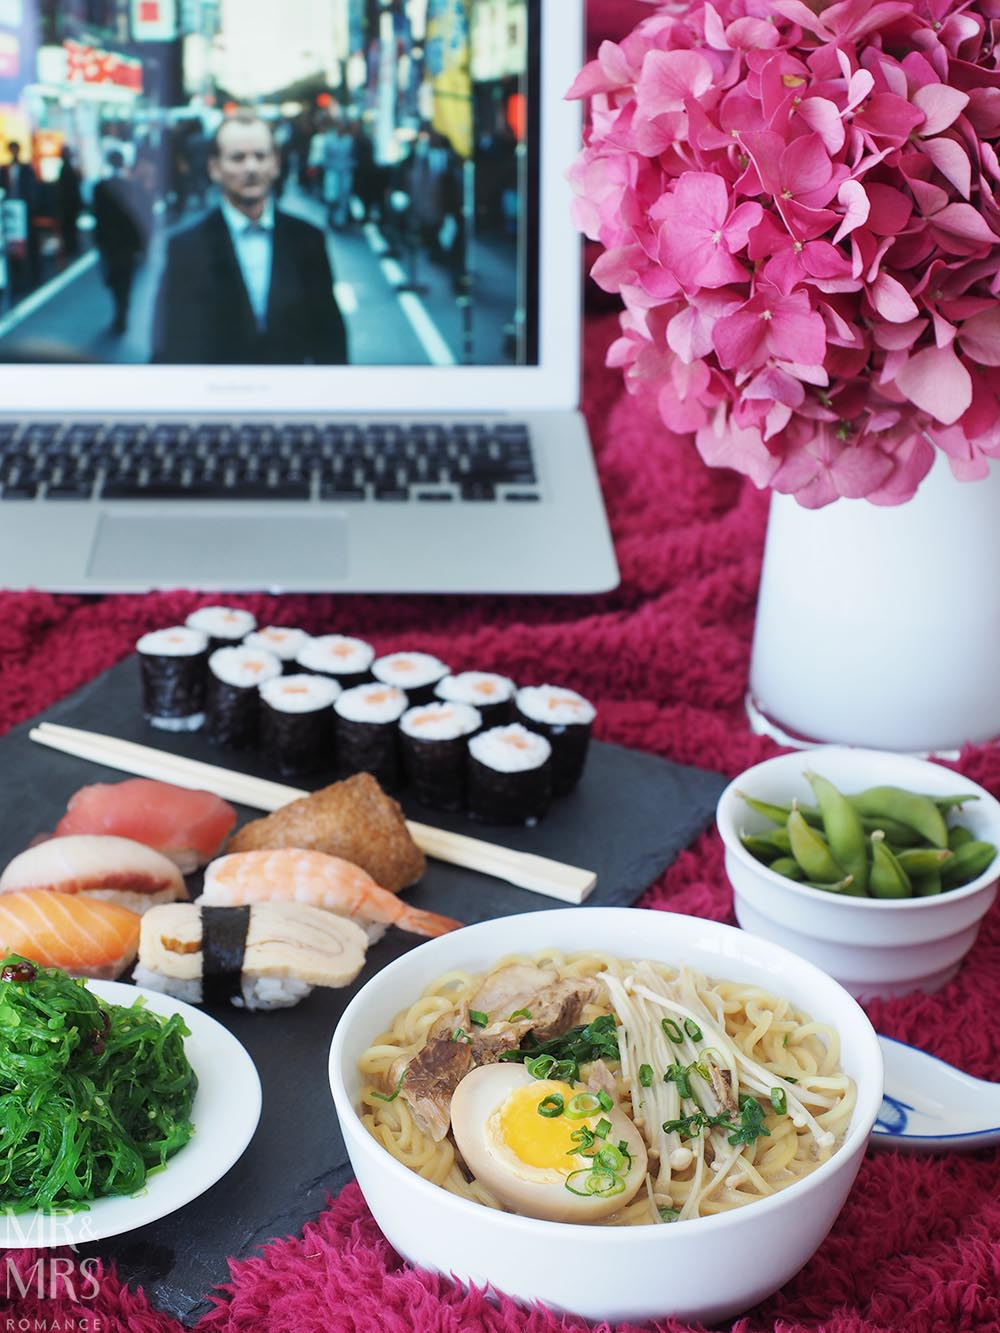 Uber Eats date night - Mr and Mrs Romance food